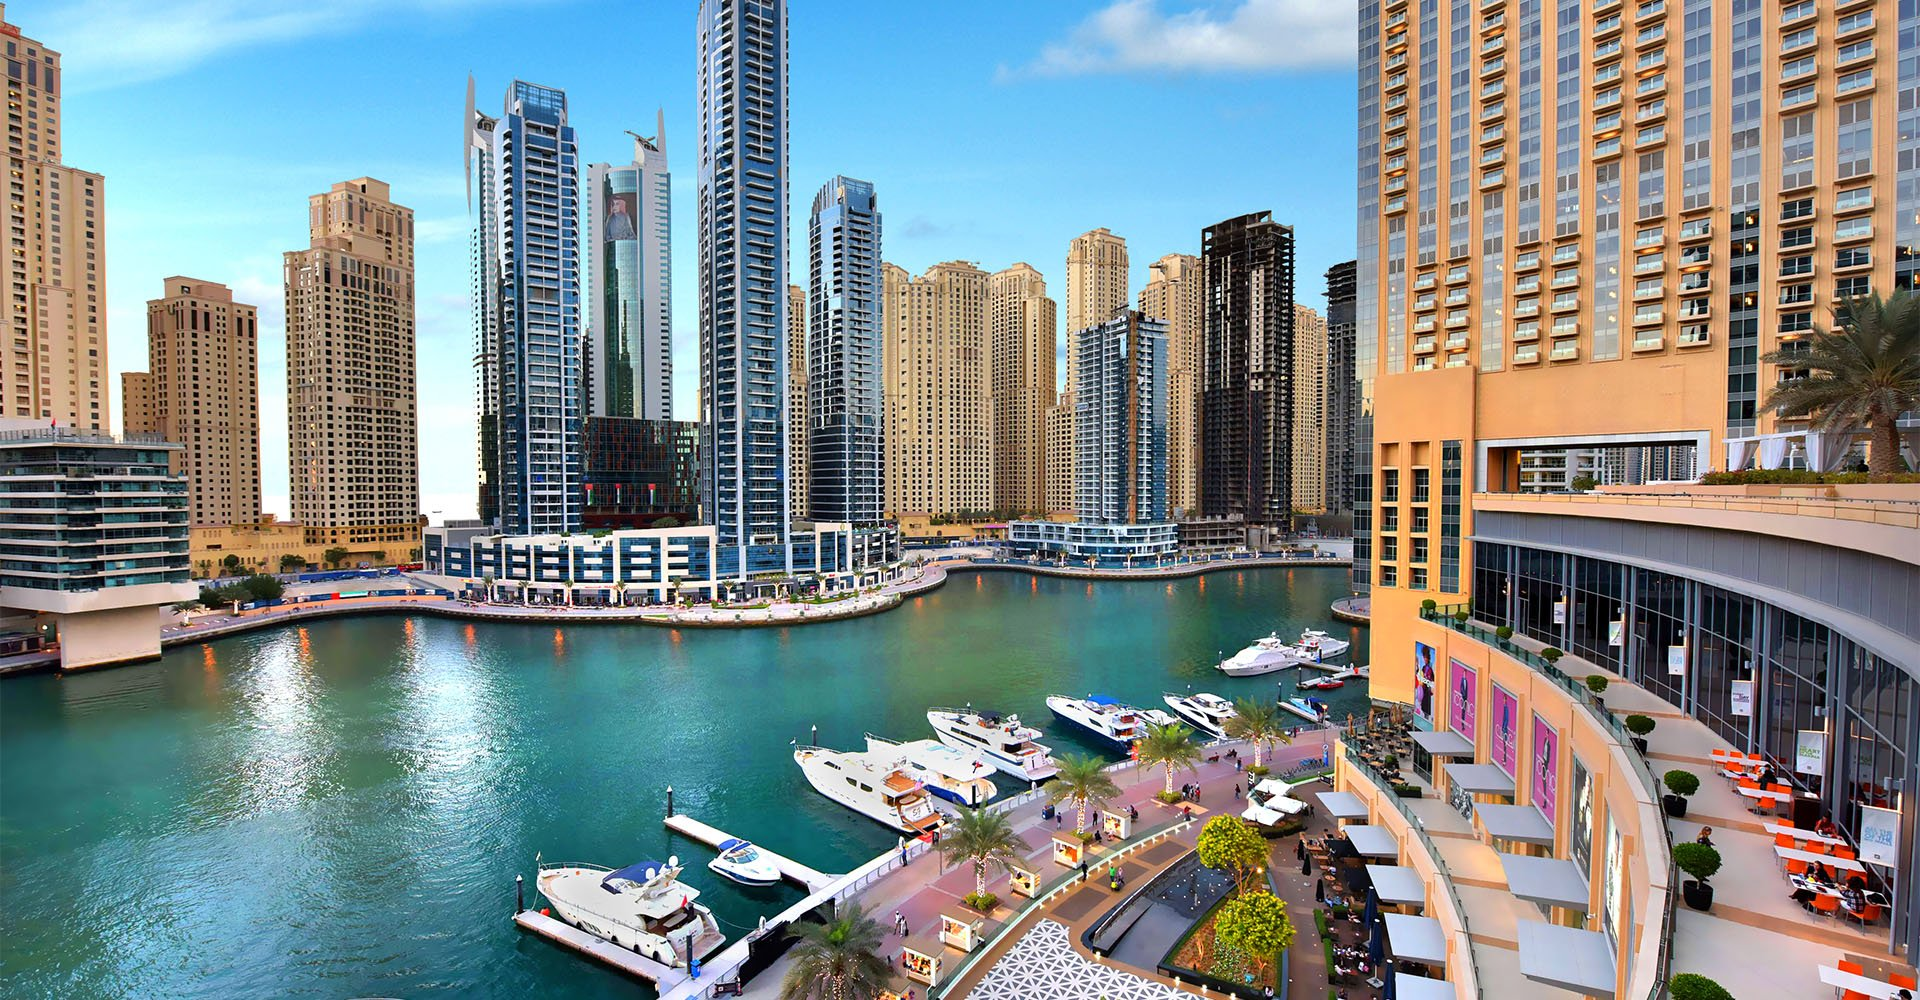 Dubai Marina Yacth Club